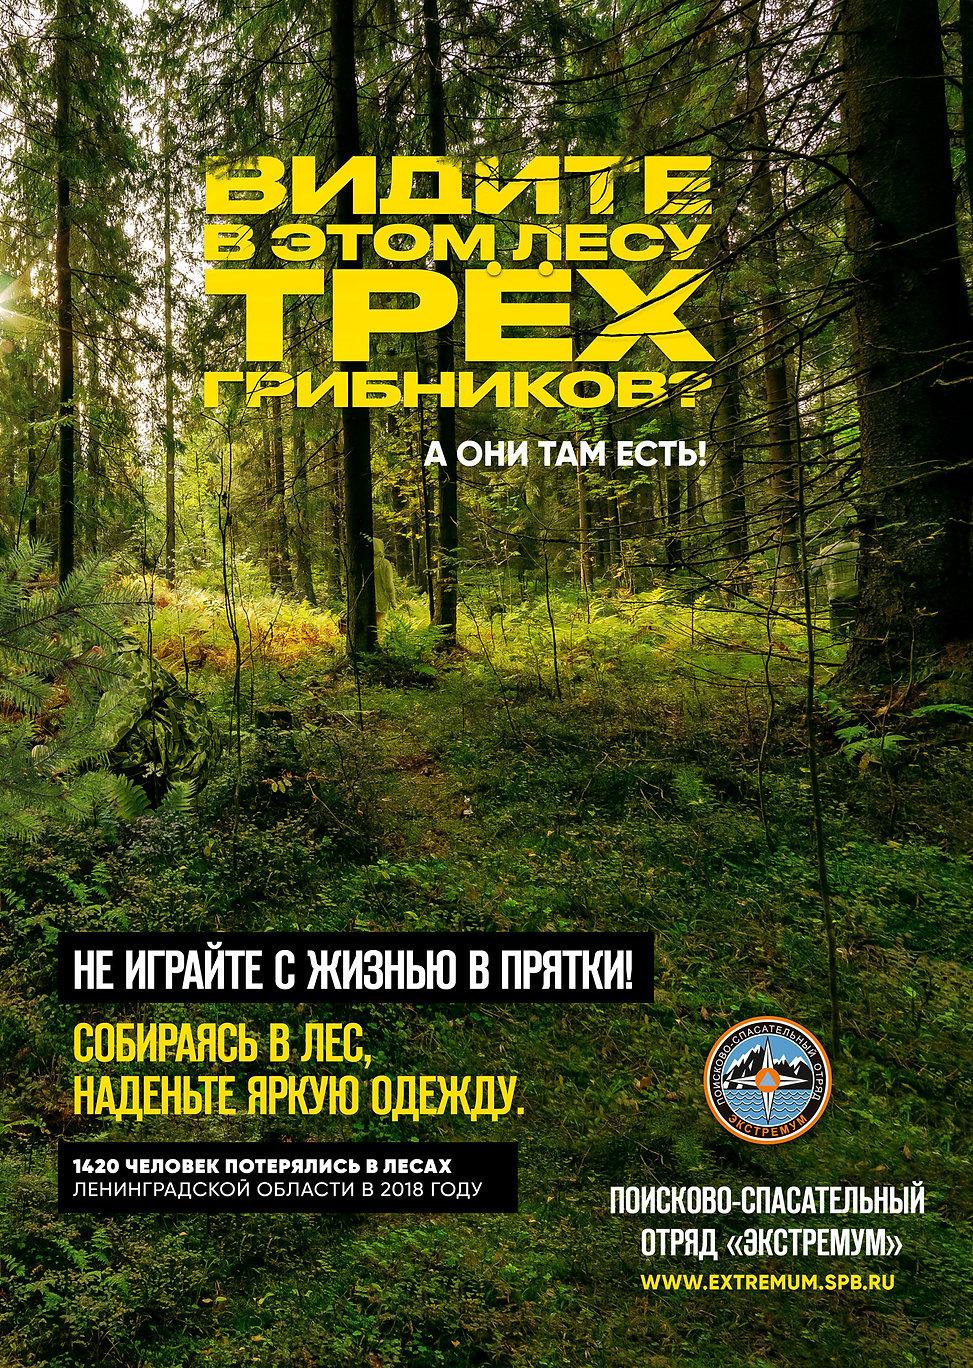 Kollegi CA. Экстремум Extremum грибники реклама Плакат